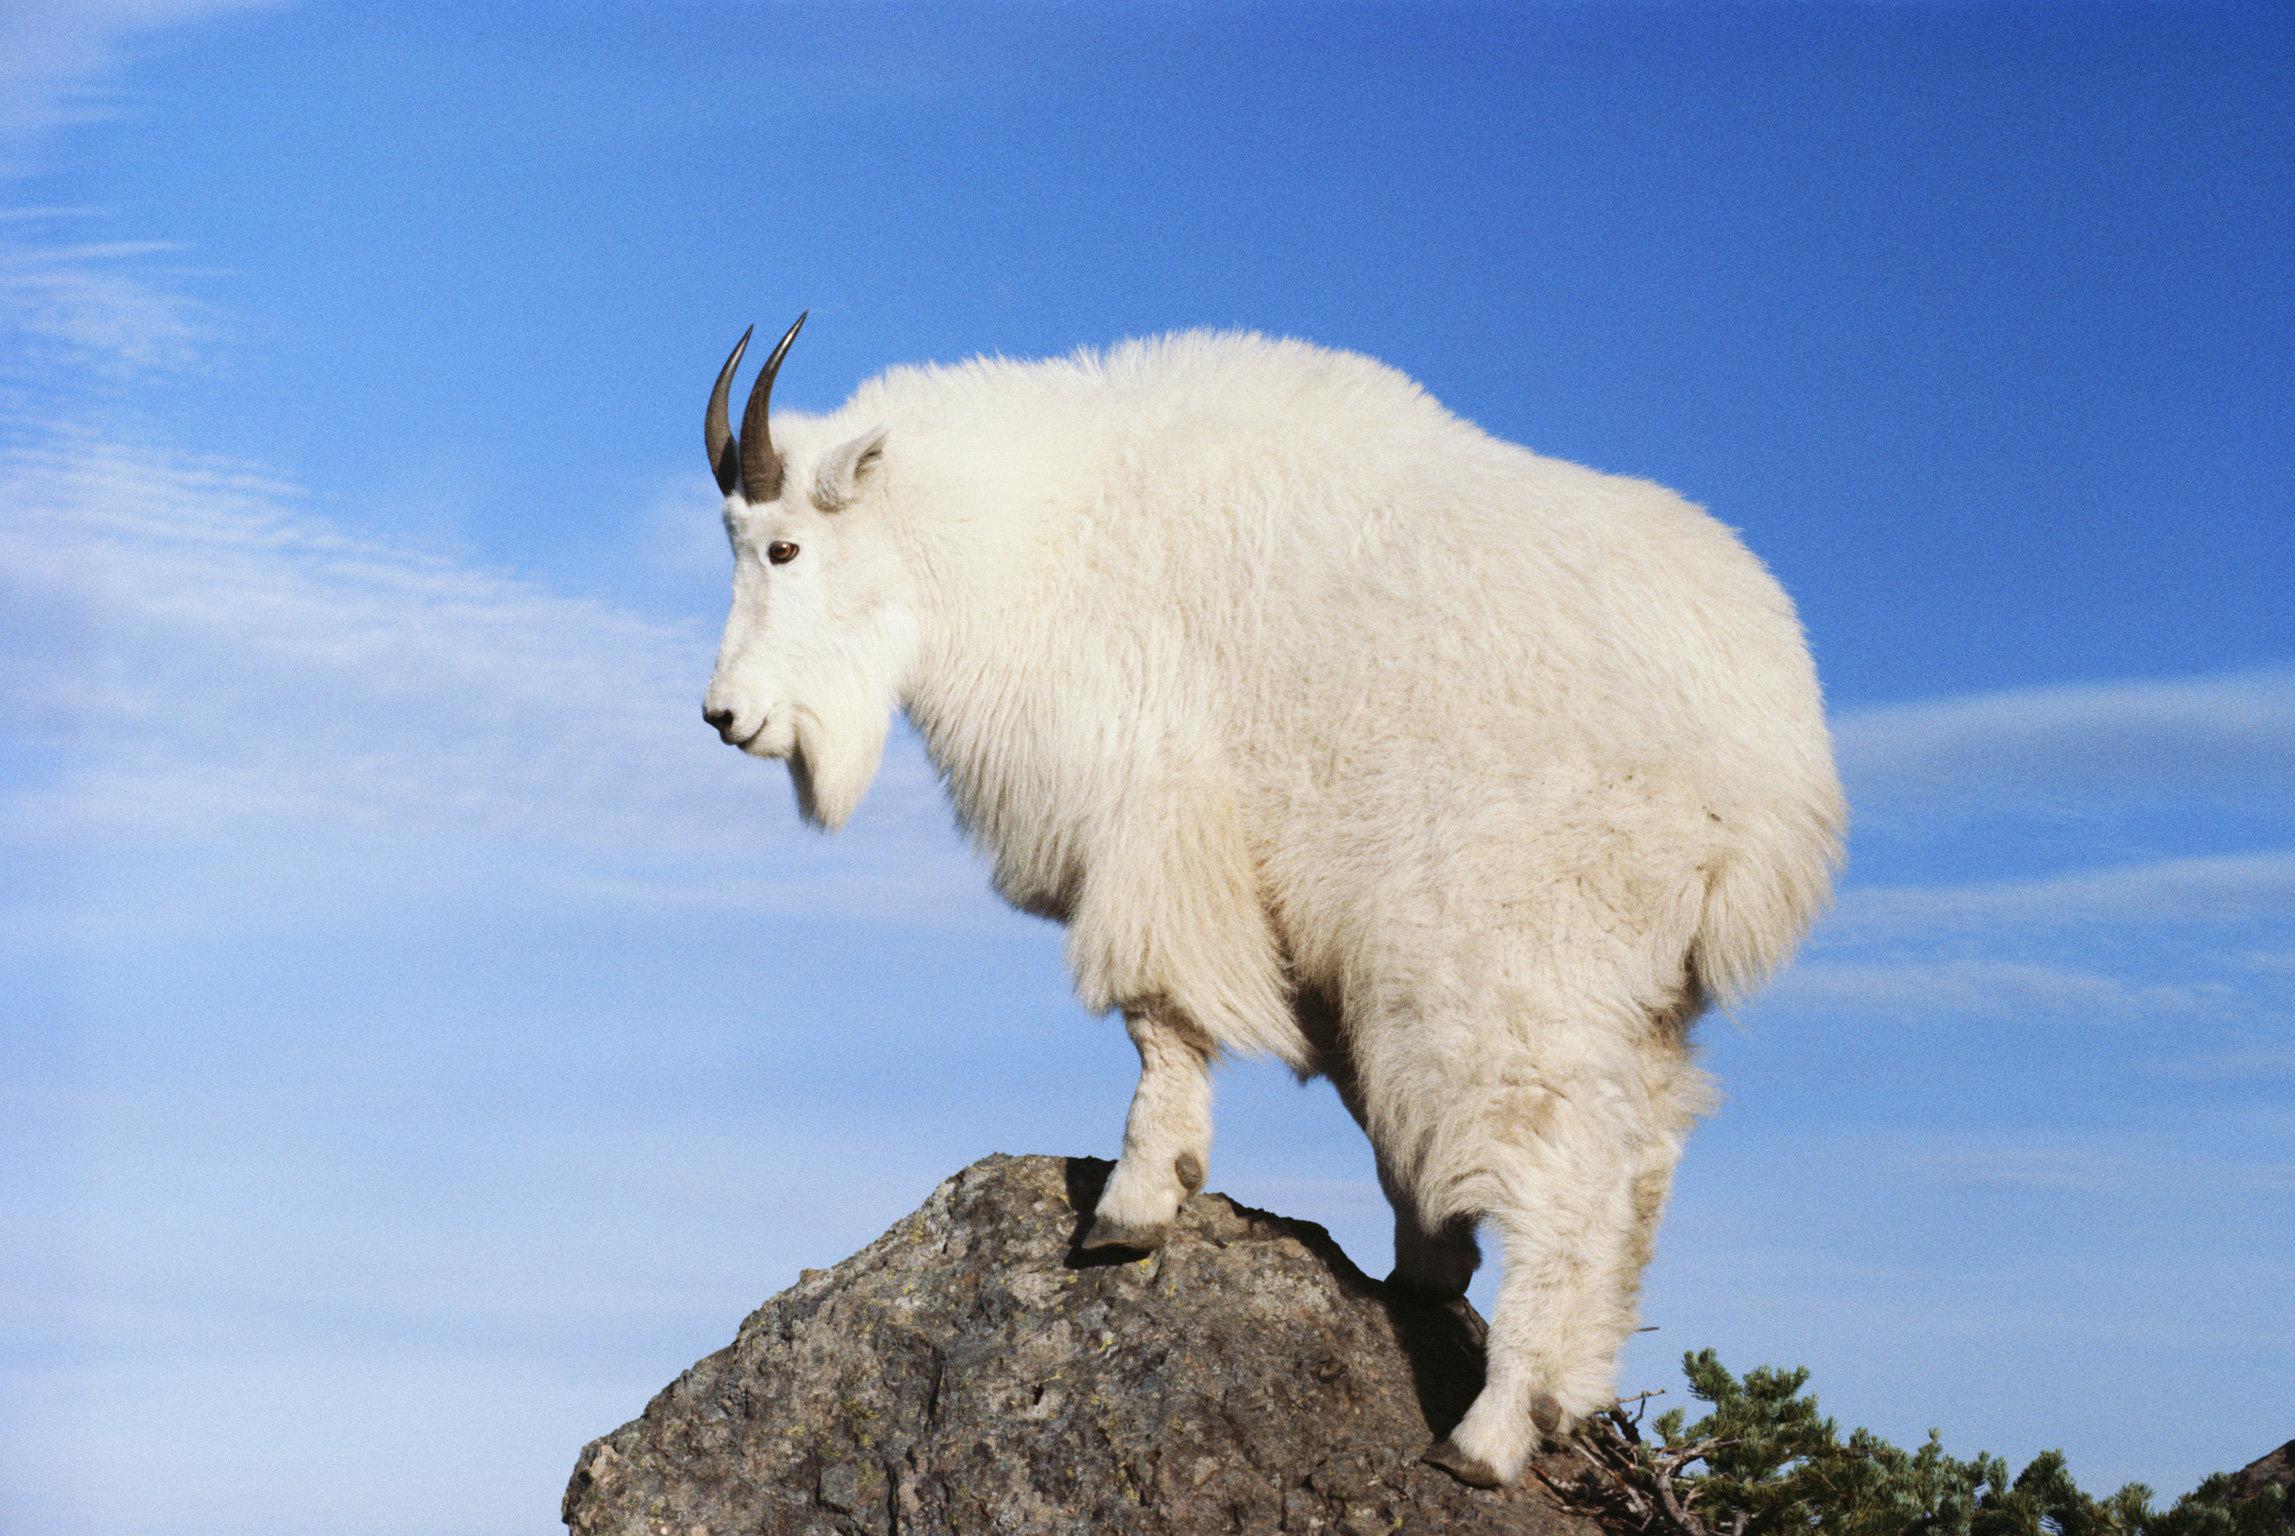 U2018aggressive U2019 Mountain Goats Are Thirsting For Human Pee